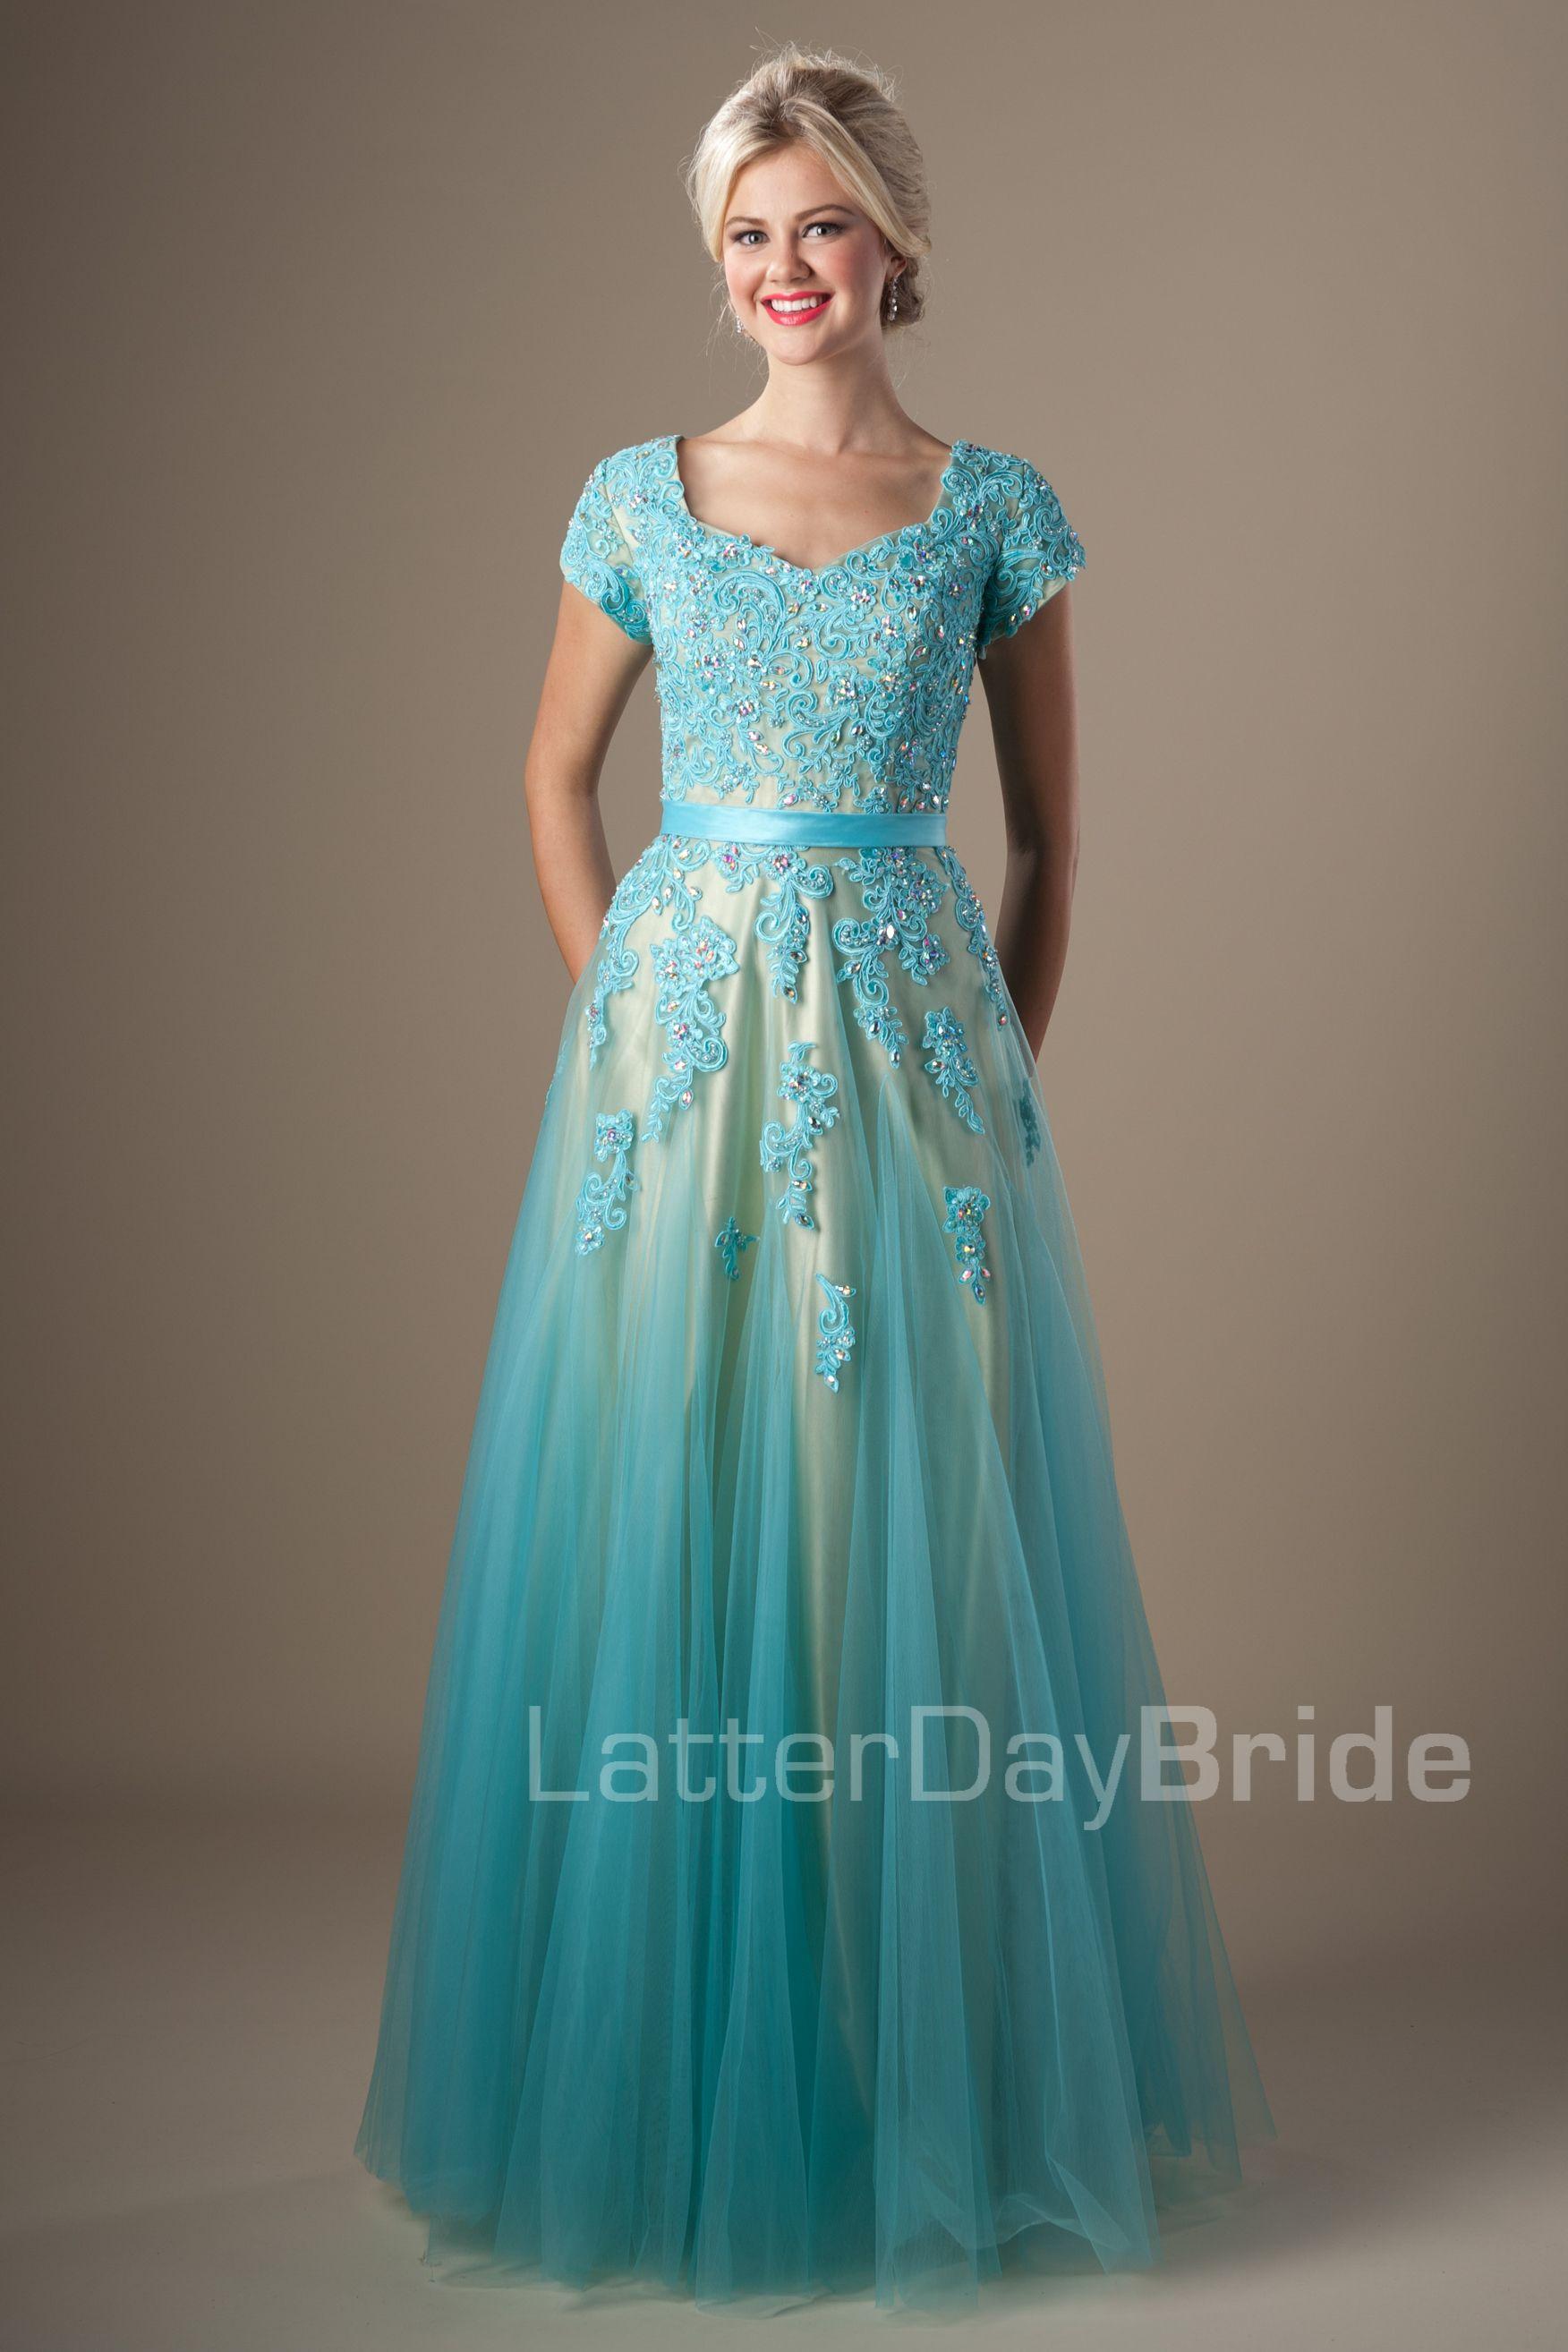 Modest Prom Dresses : Rylie   Modest Prom Dresses   Pinterest ...